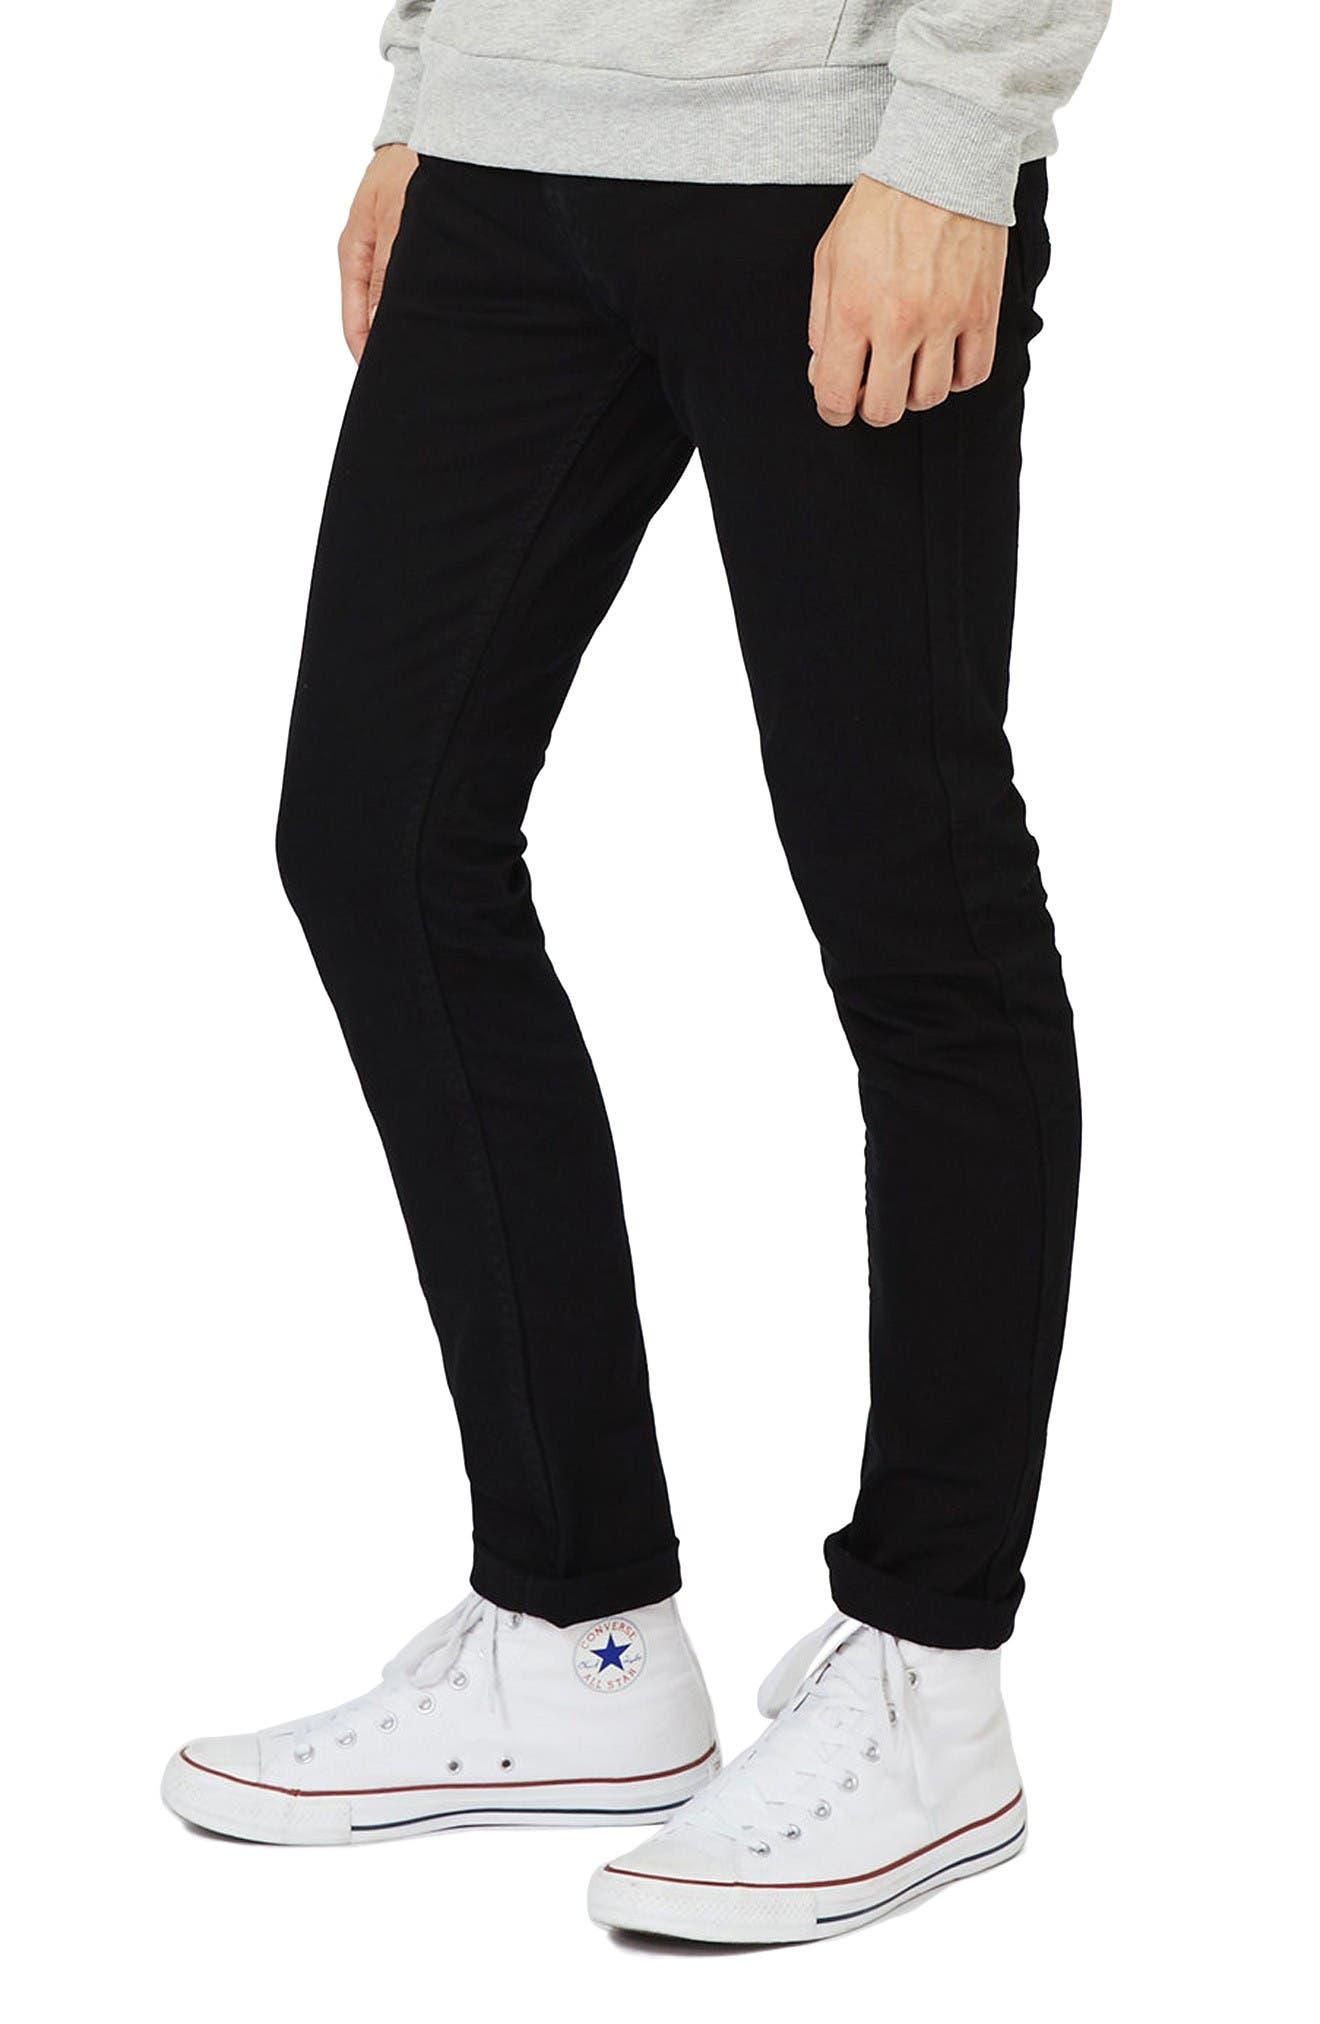 Topman Skinny Stretch Jeans | Nordstrom